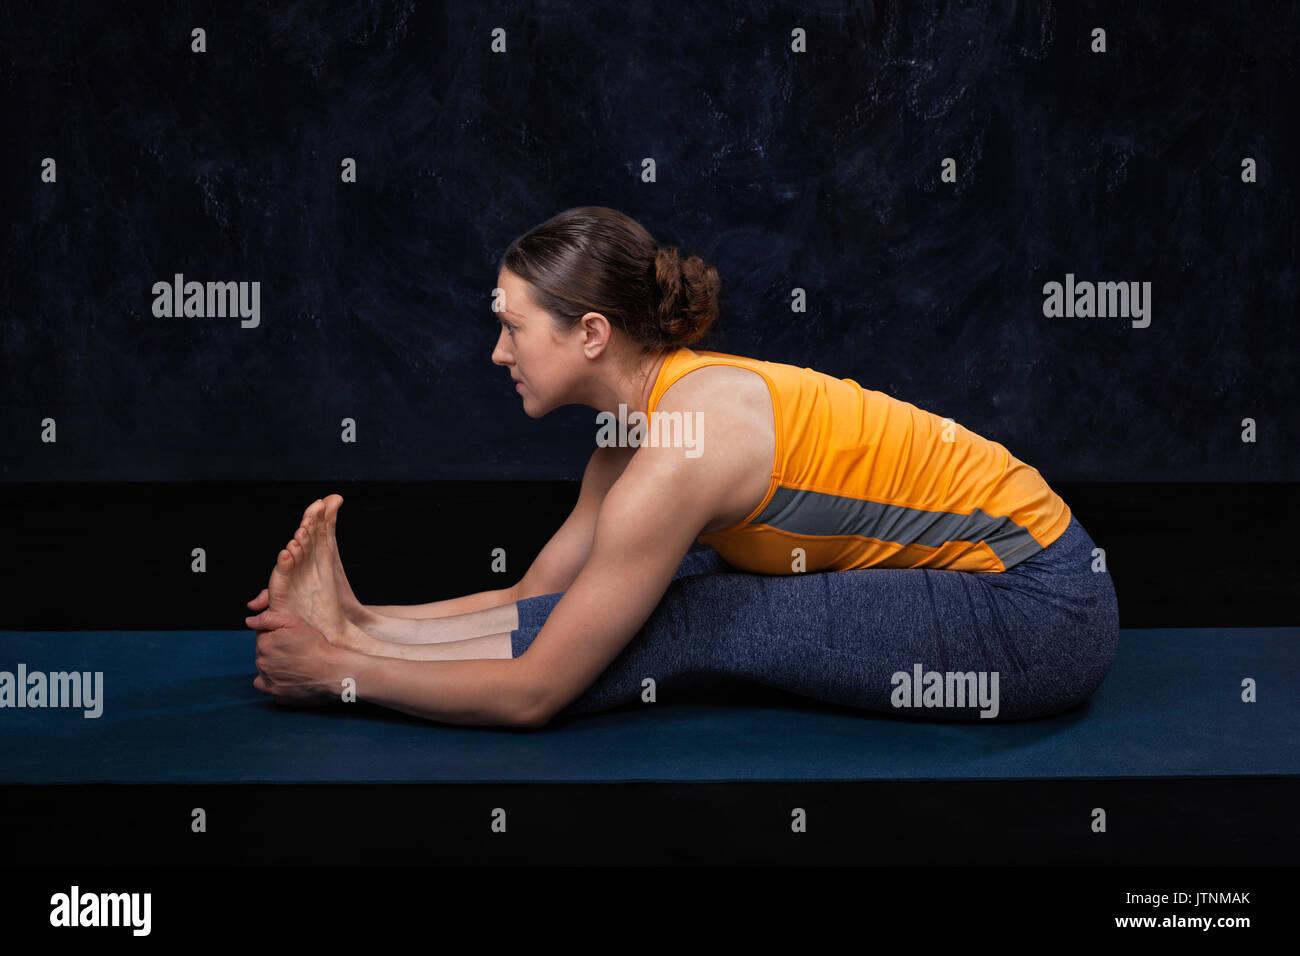 Woman doing Hatha yoga Ashtanga Vinyasa yoga asana Paschimottana - Stock Image